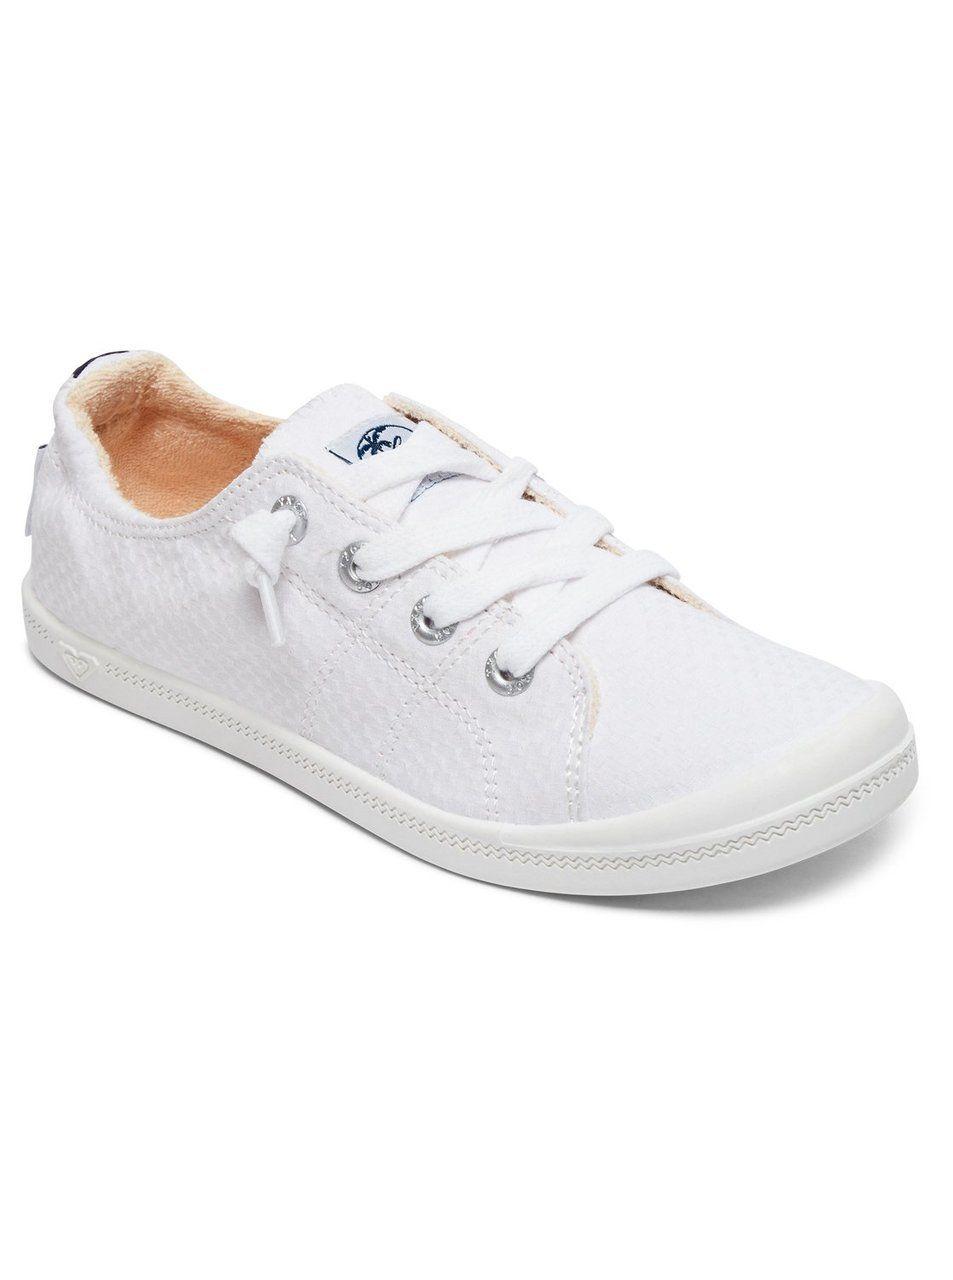 Roxy Womens Bayshore III Casual Shoes